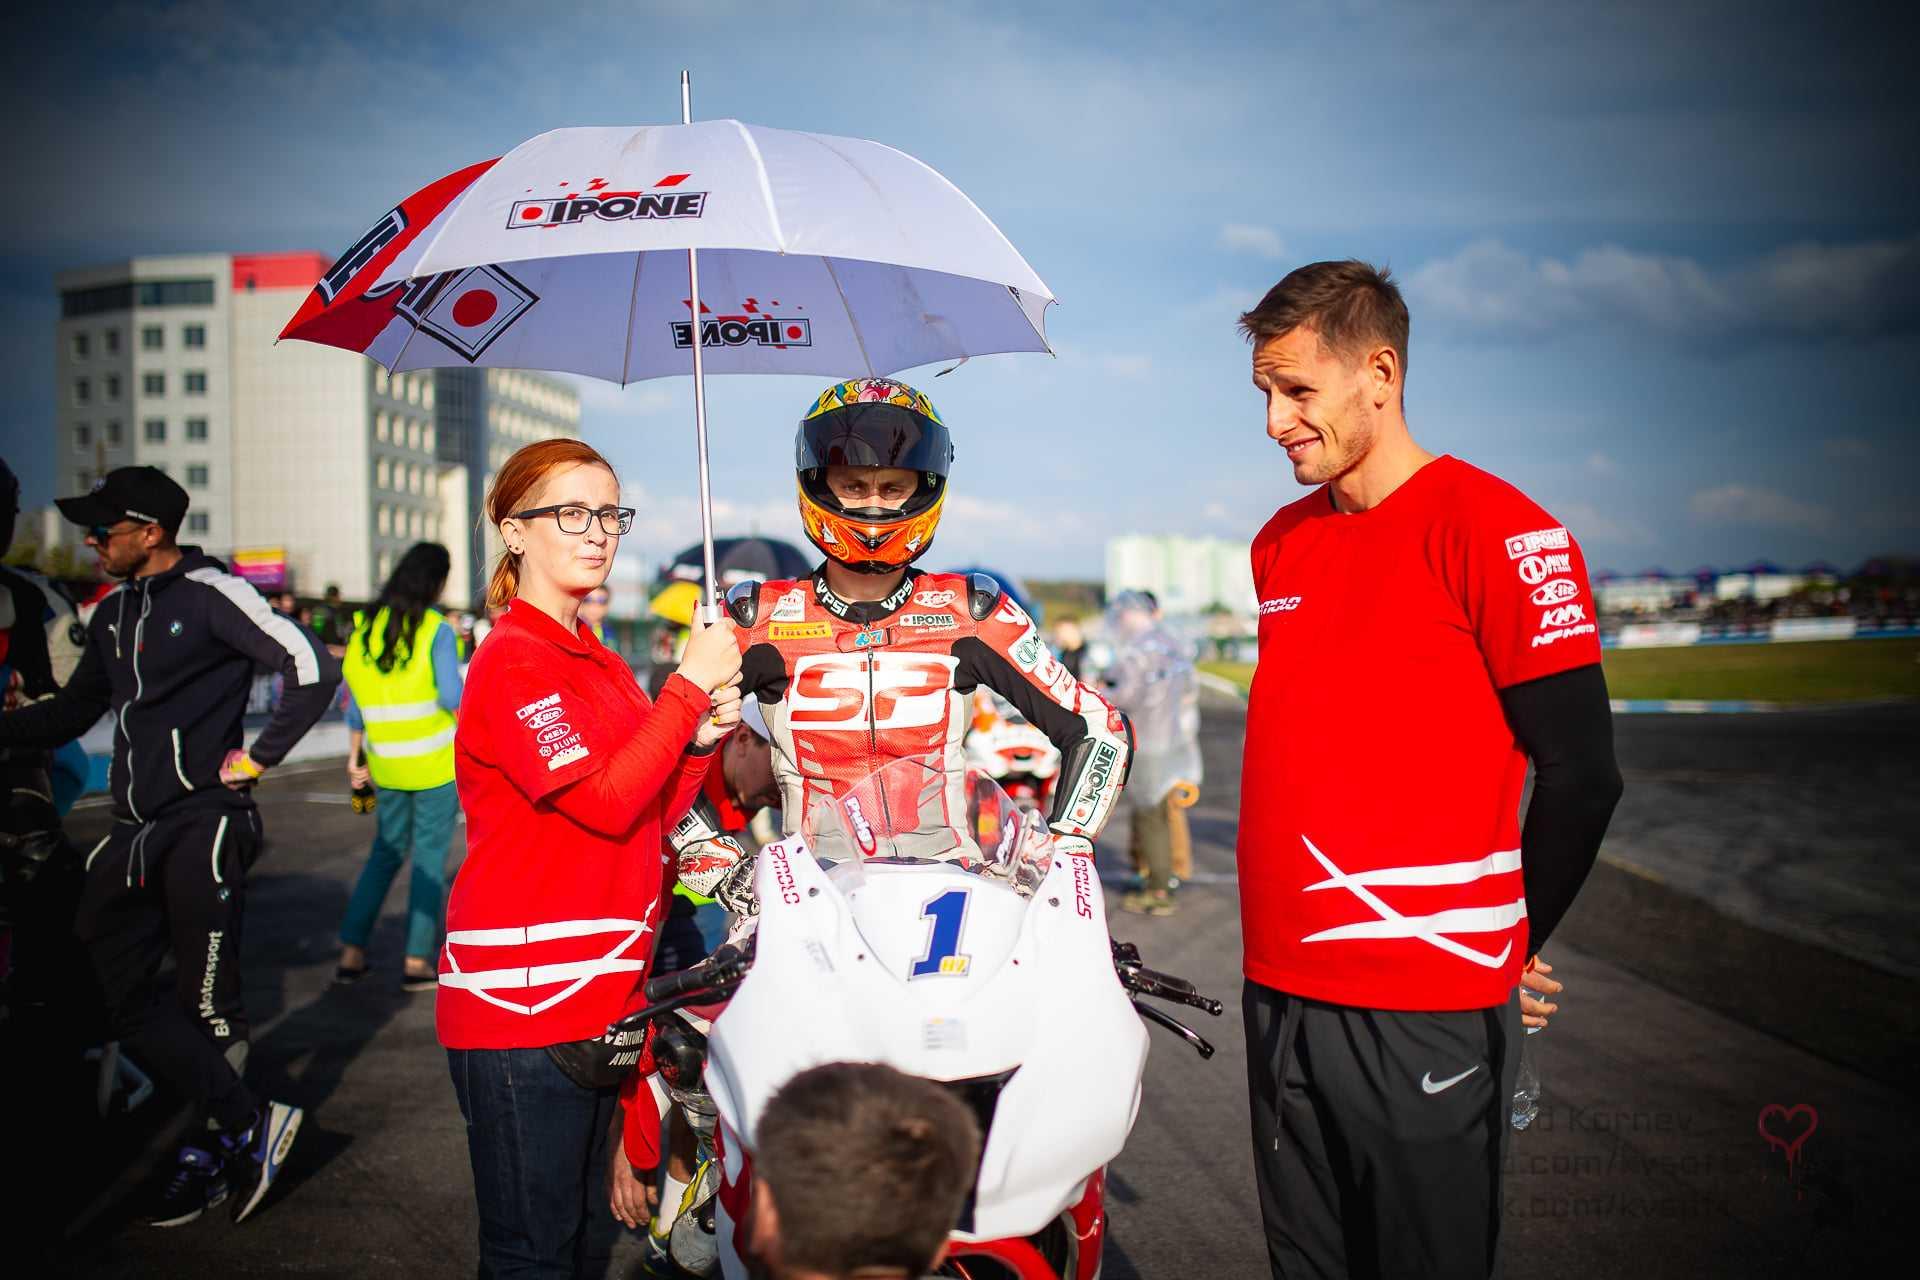 5-6_etap_MotoGPUkraine_095